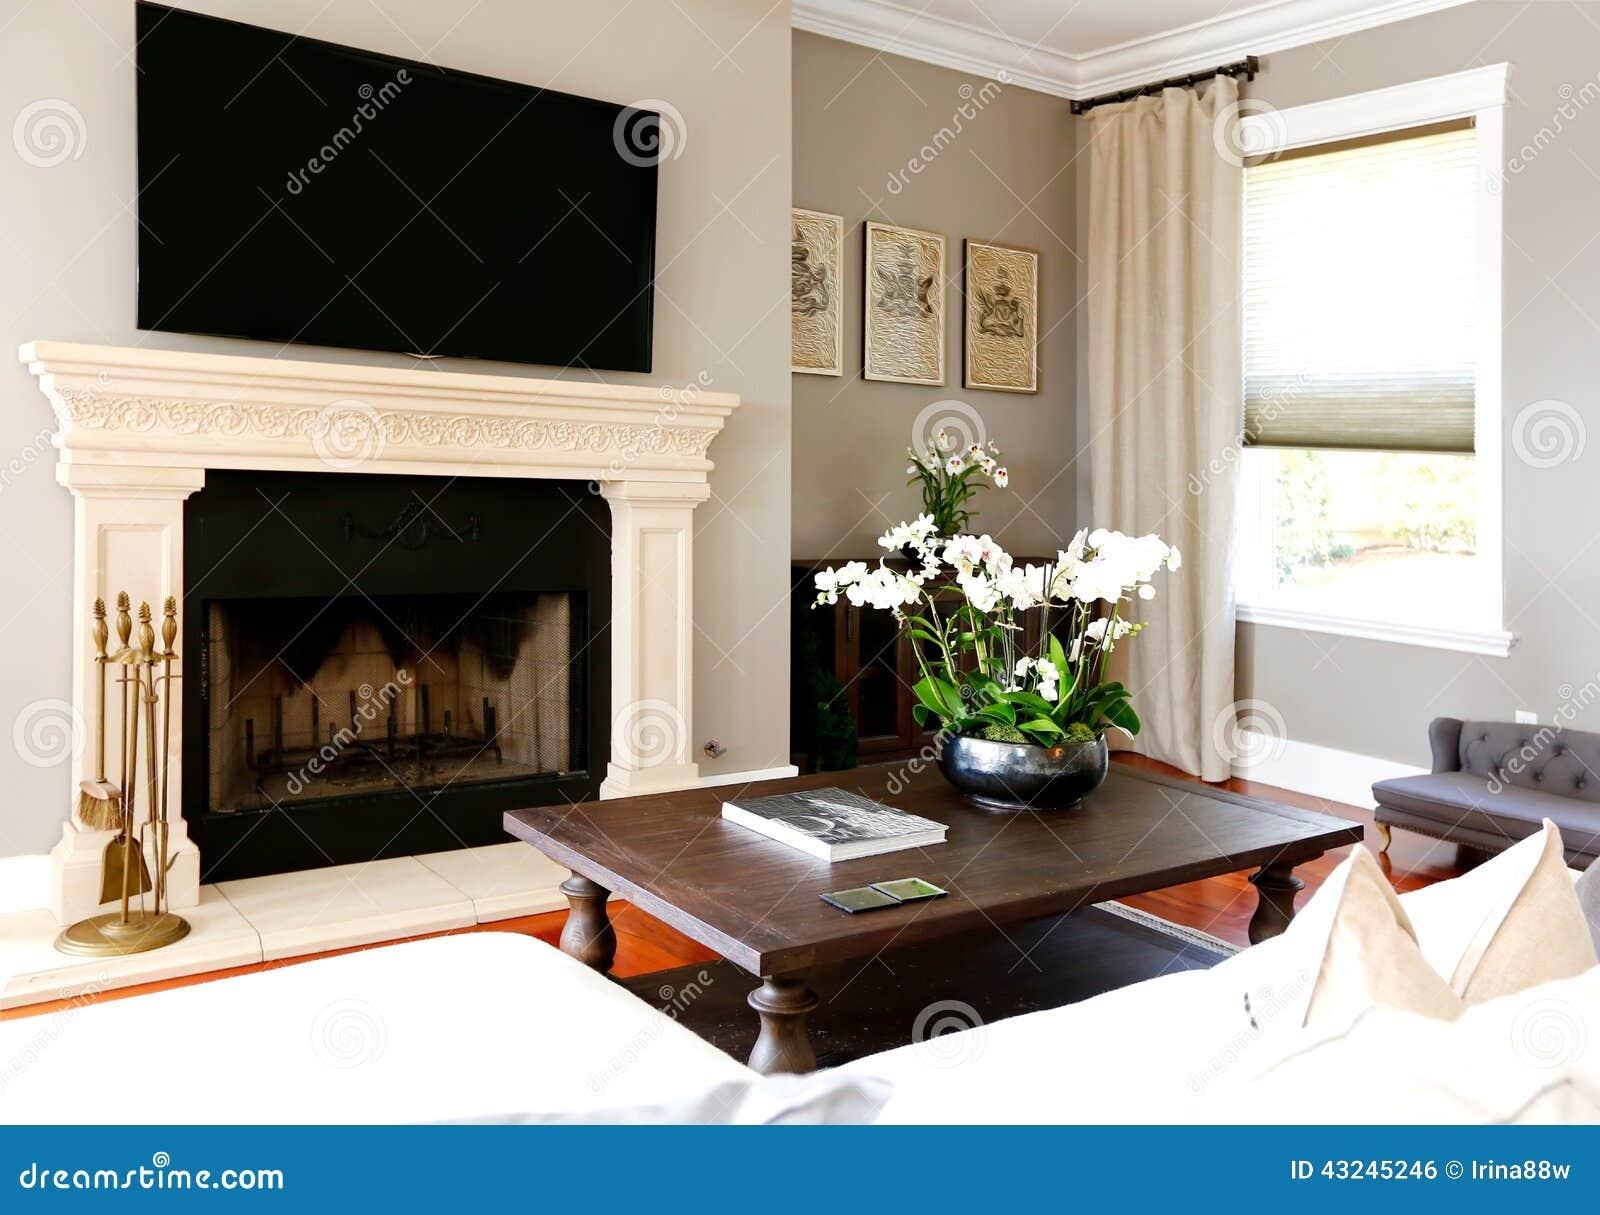 Salon de luxe lumineux avec la chemin e et la tv photo for Chemin de table lumineux